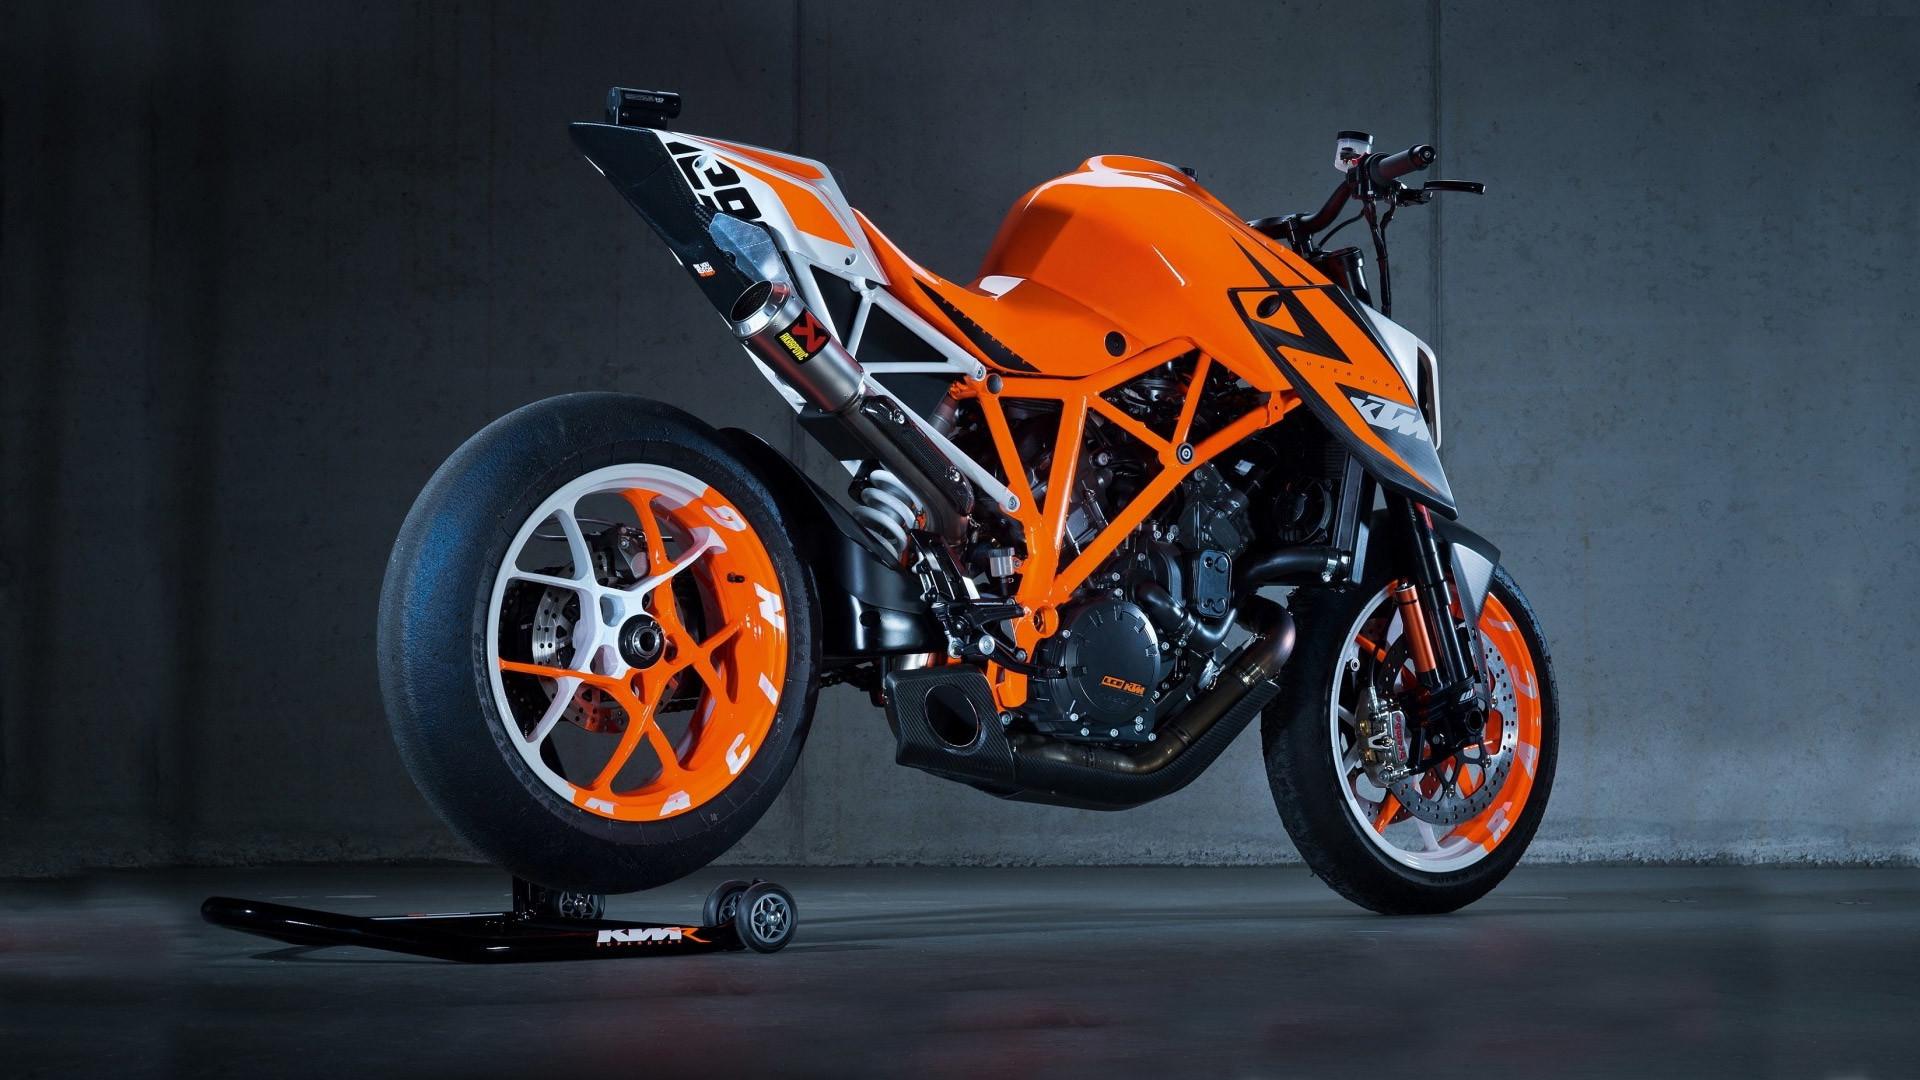 Luxury Motorcycle Hd Wallpapers: Motorbike Wallpaper ·① WallpaperTag